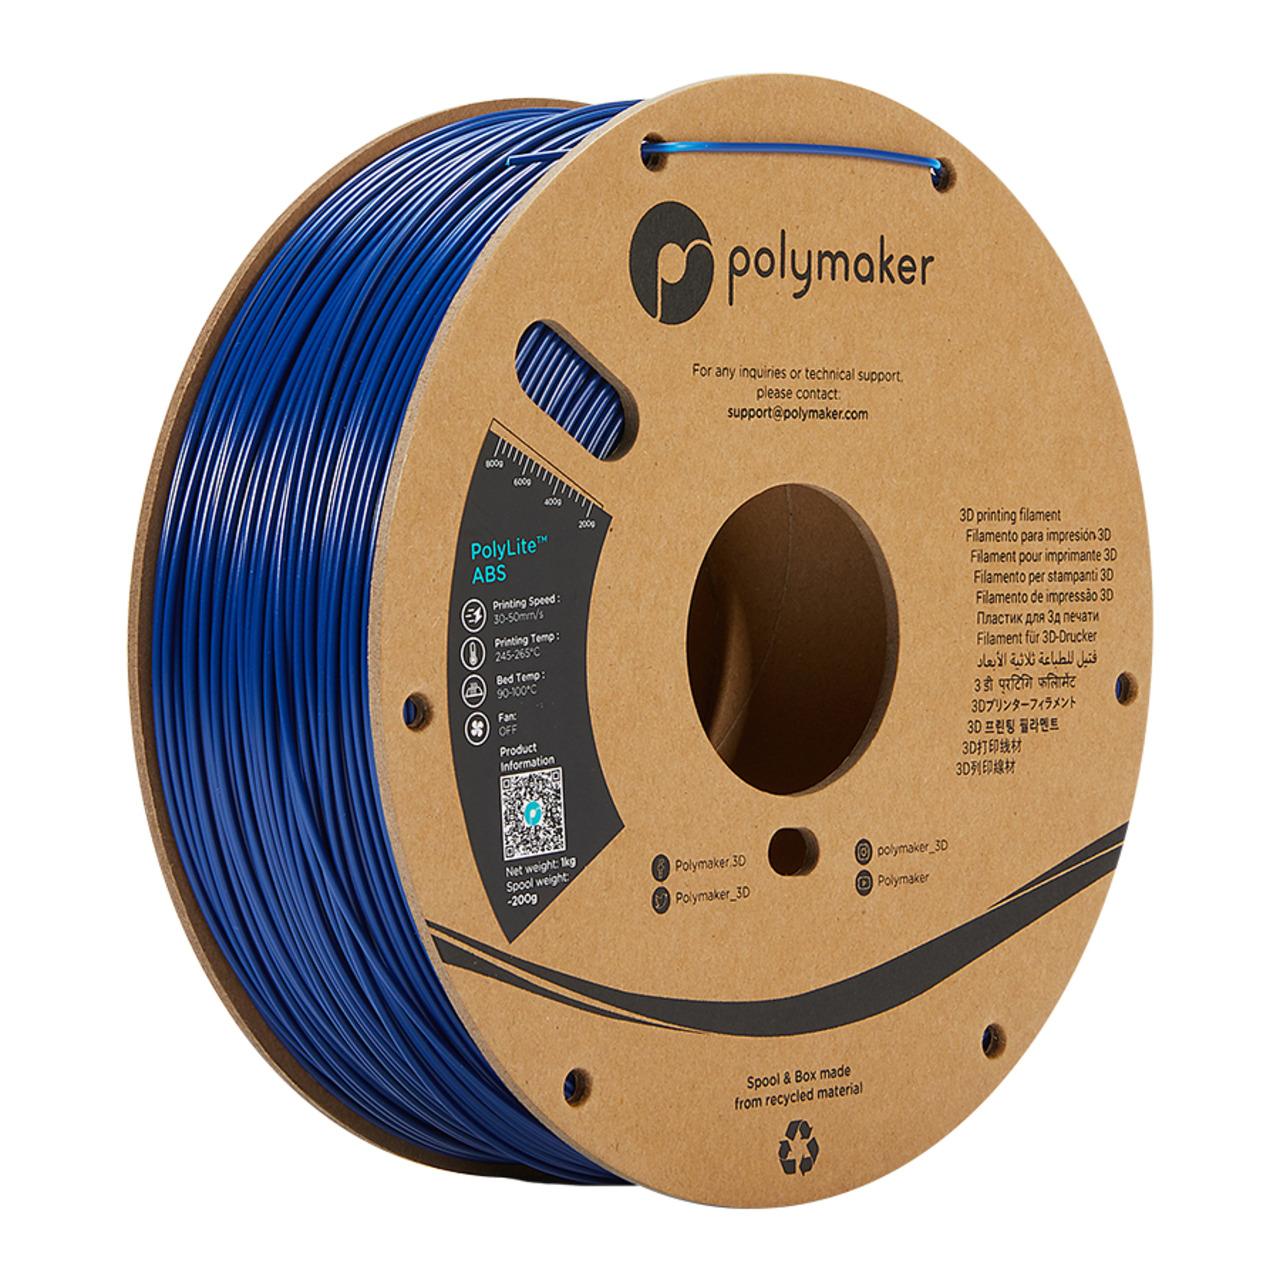 Polymaker Polylite ABS-Filament- blau- 1-75 mm- 1 kg